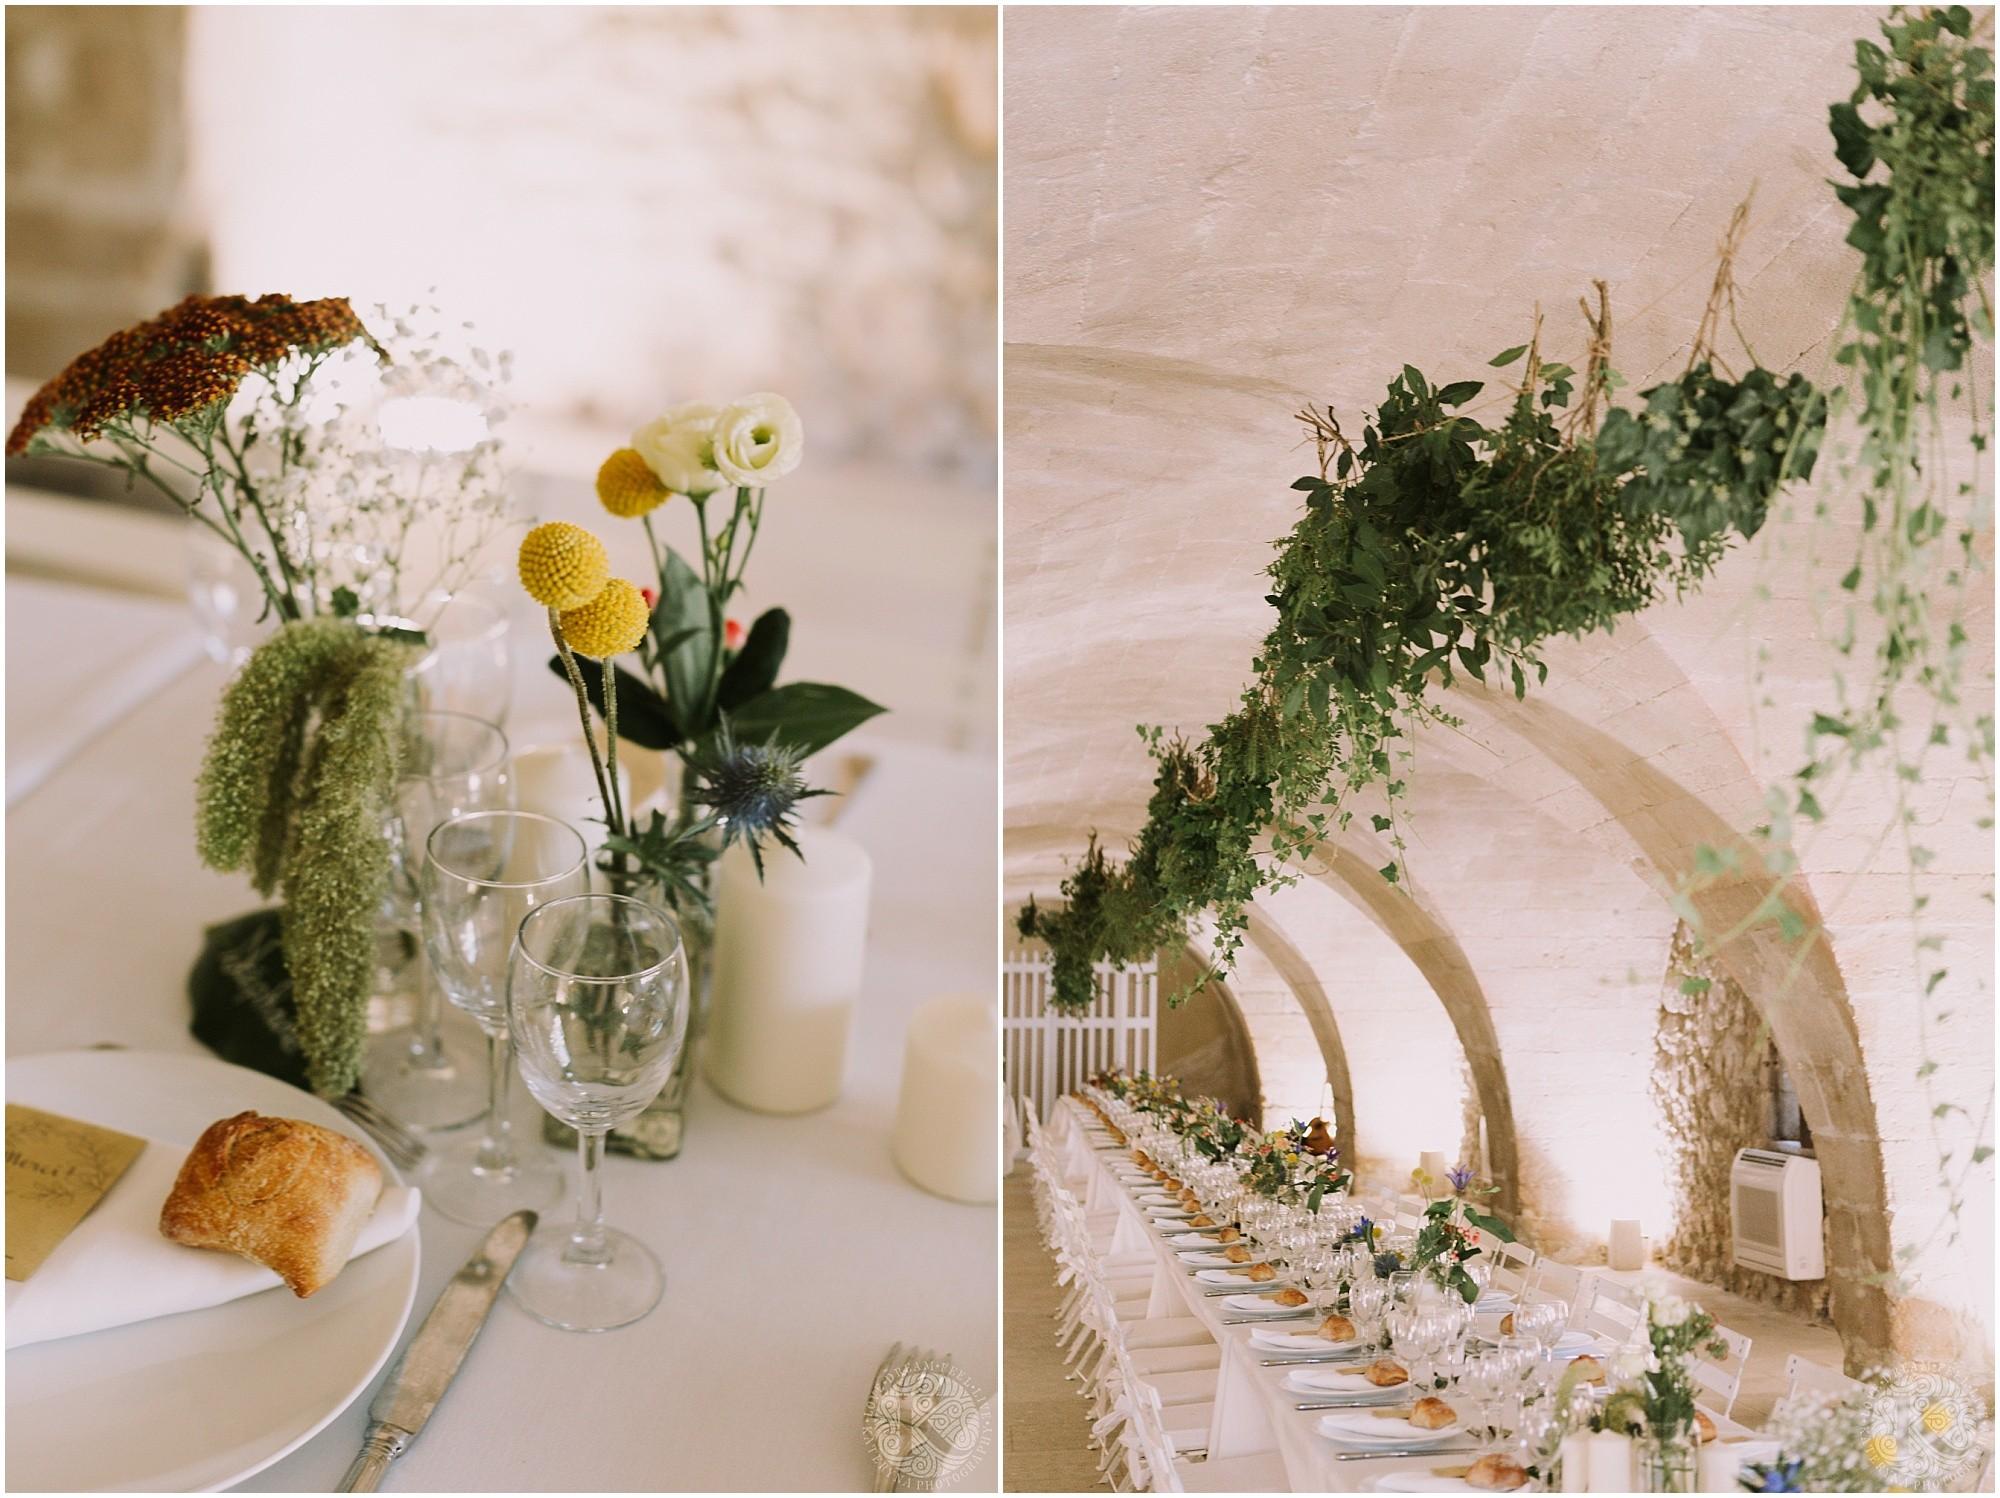 Kateryna-photos-photographe-mariage-vaucluse-provence-avignon-ferme-st-hugues_0057.jpg